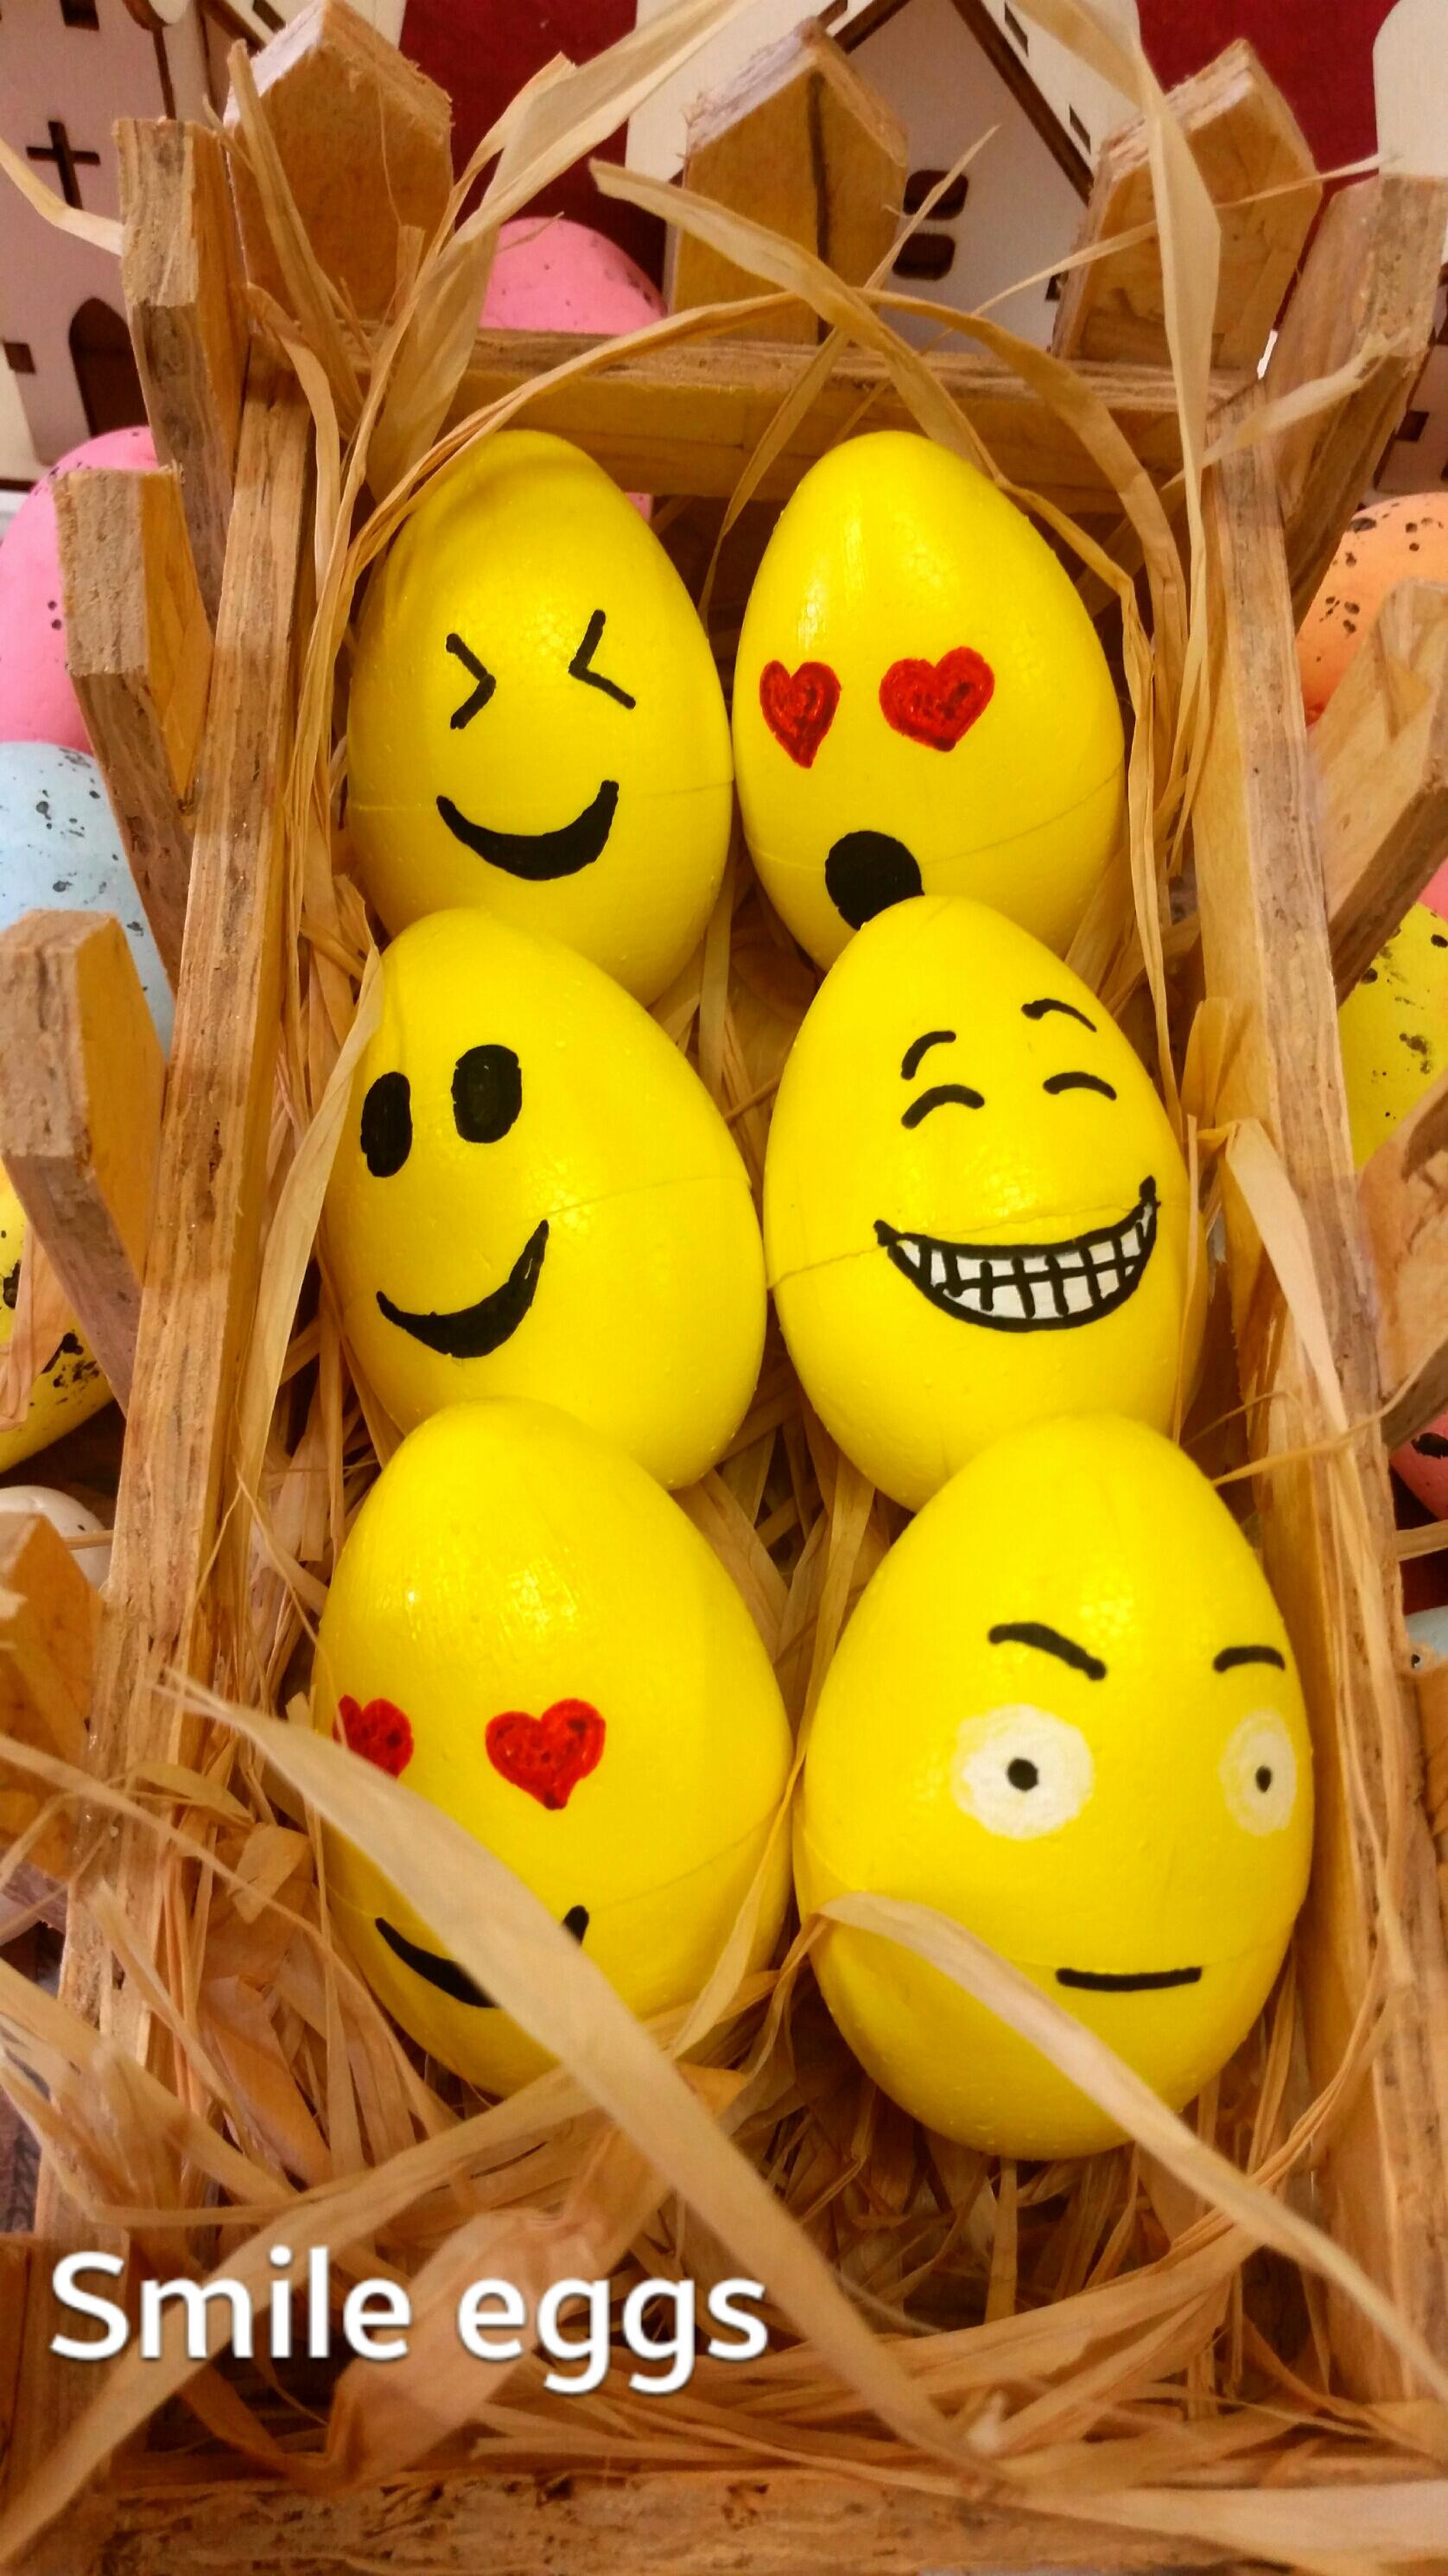 Smile eggs